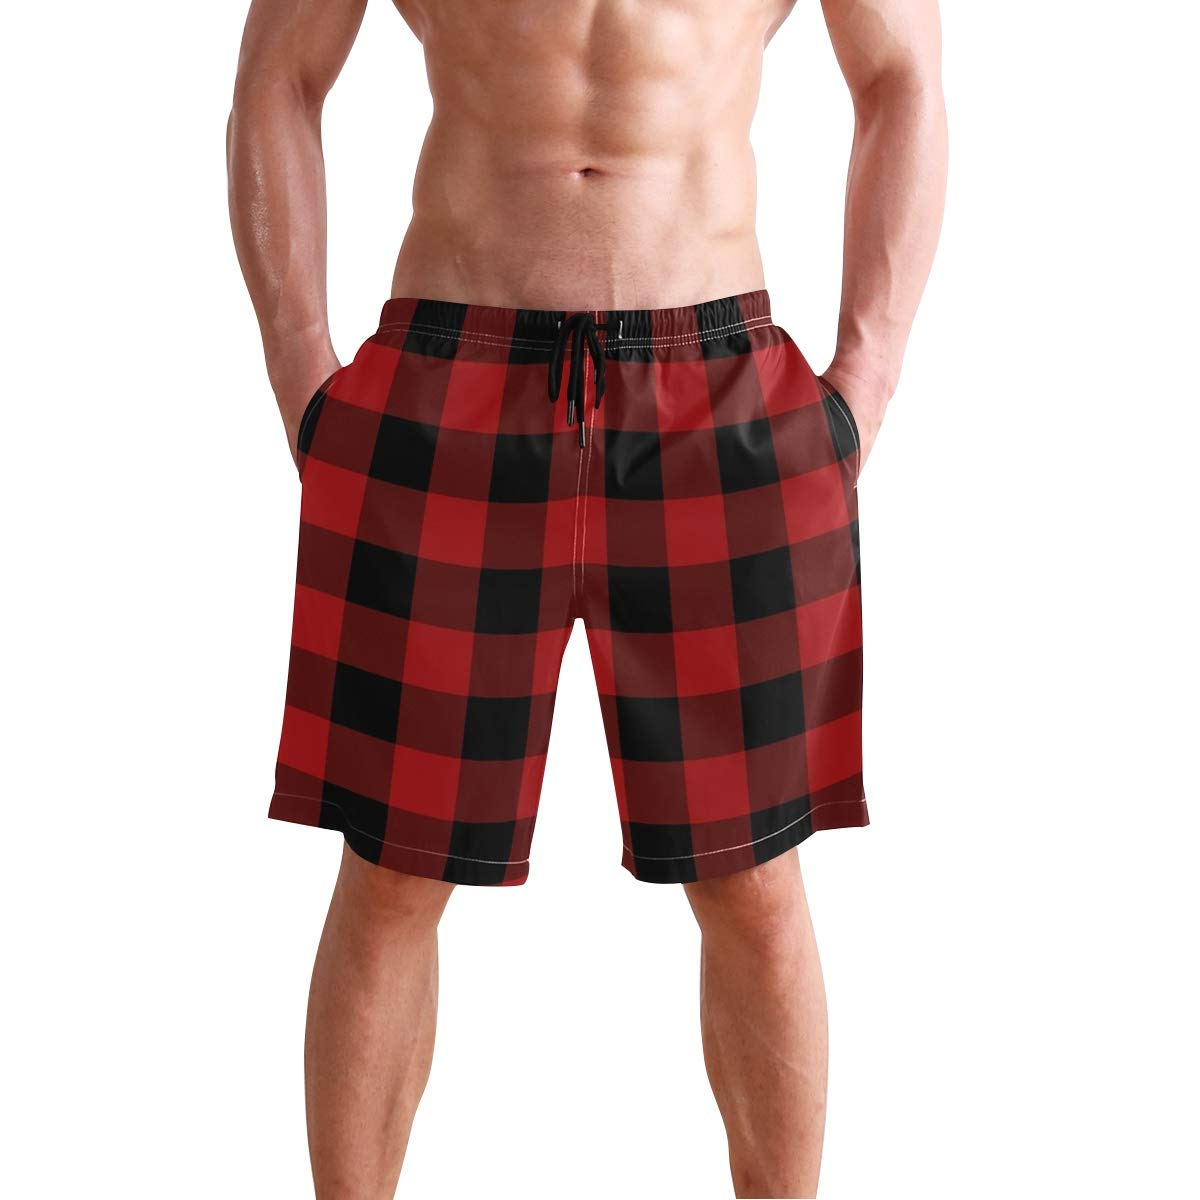 Beach Shorts for Men Boys S Swim Trunk with Buffalo Plaid Print